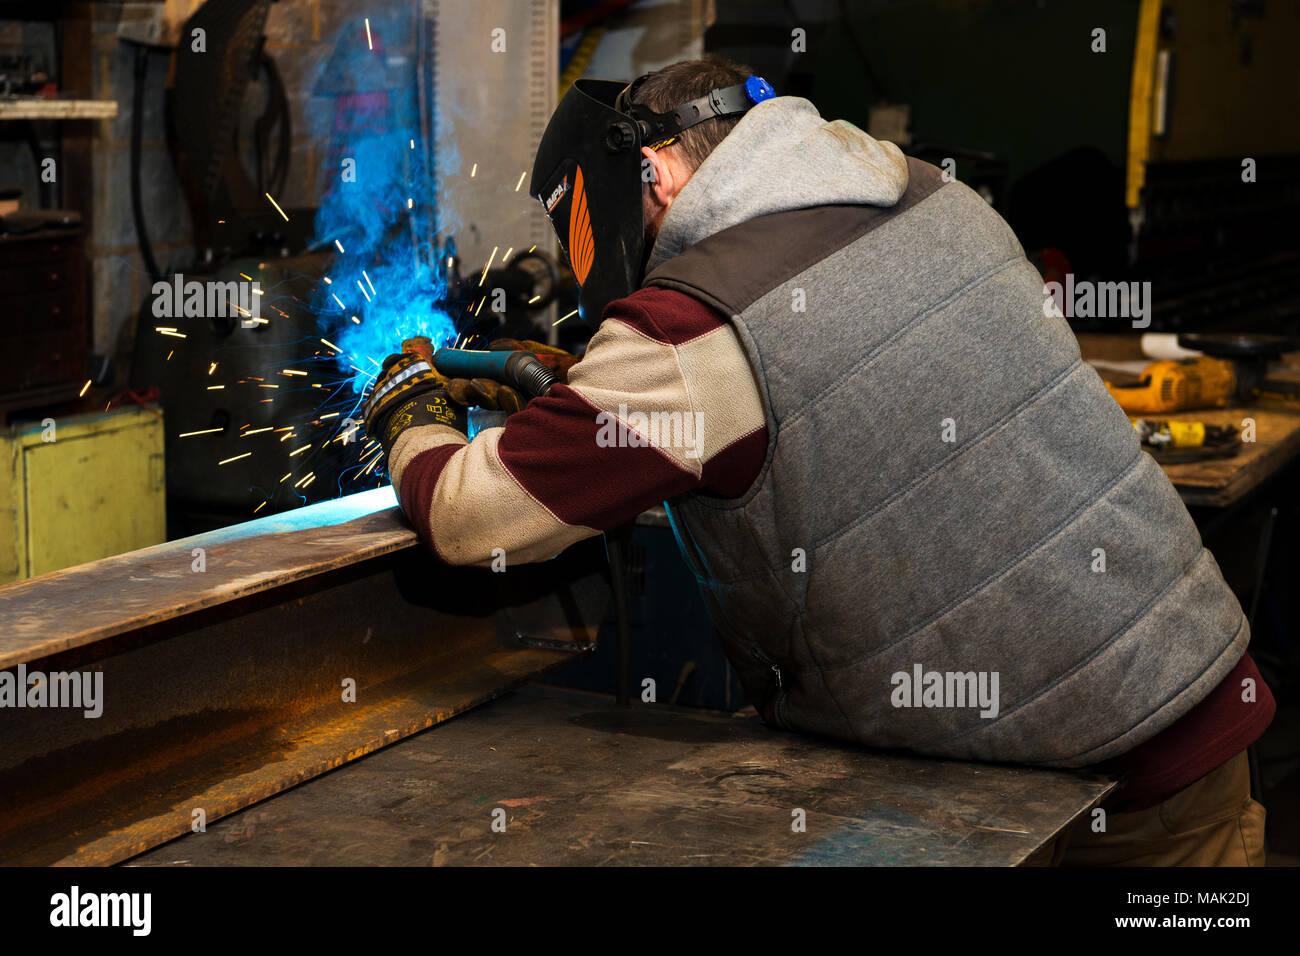 Welder arc welding steel frame - Stock Image